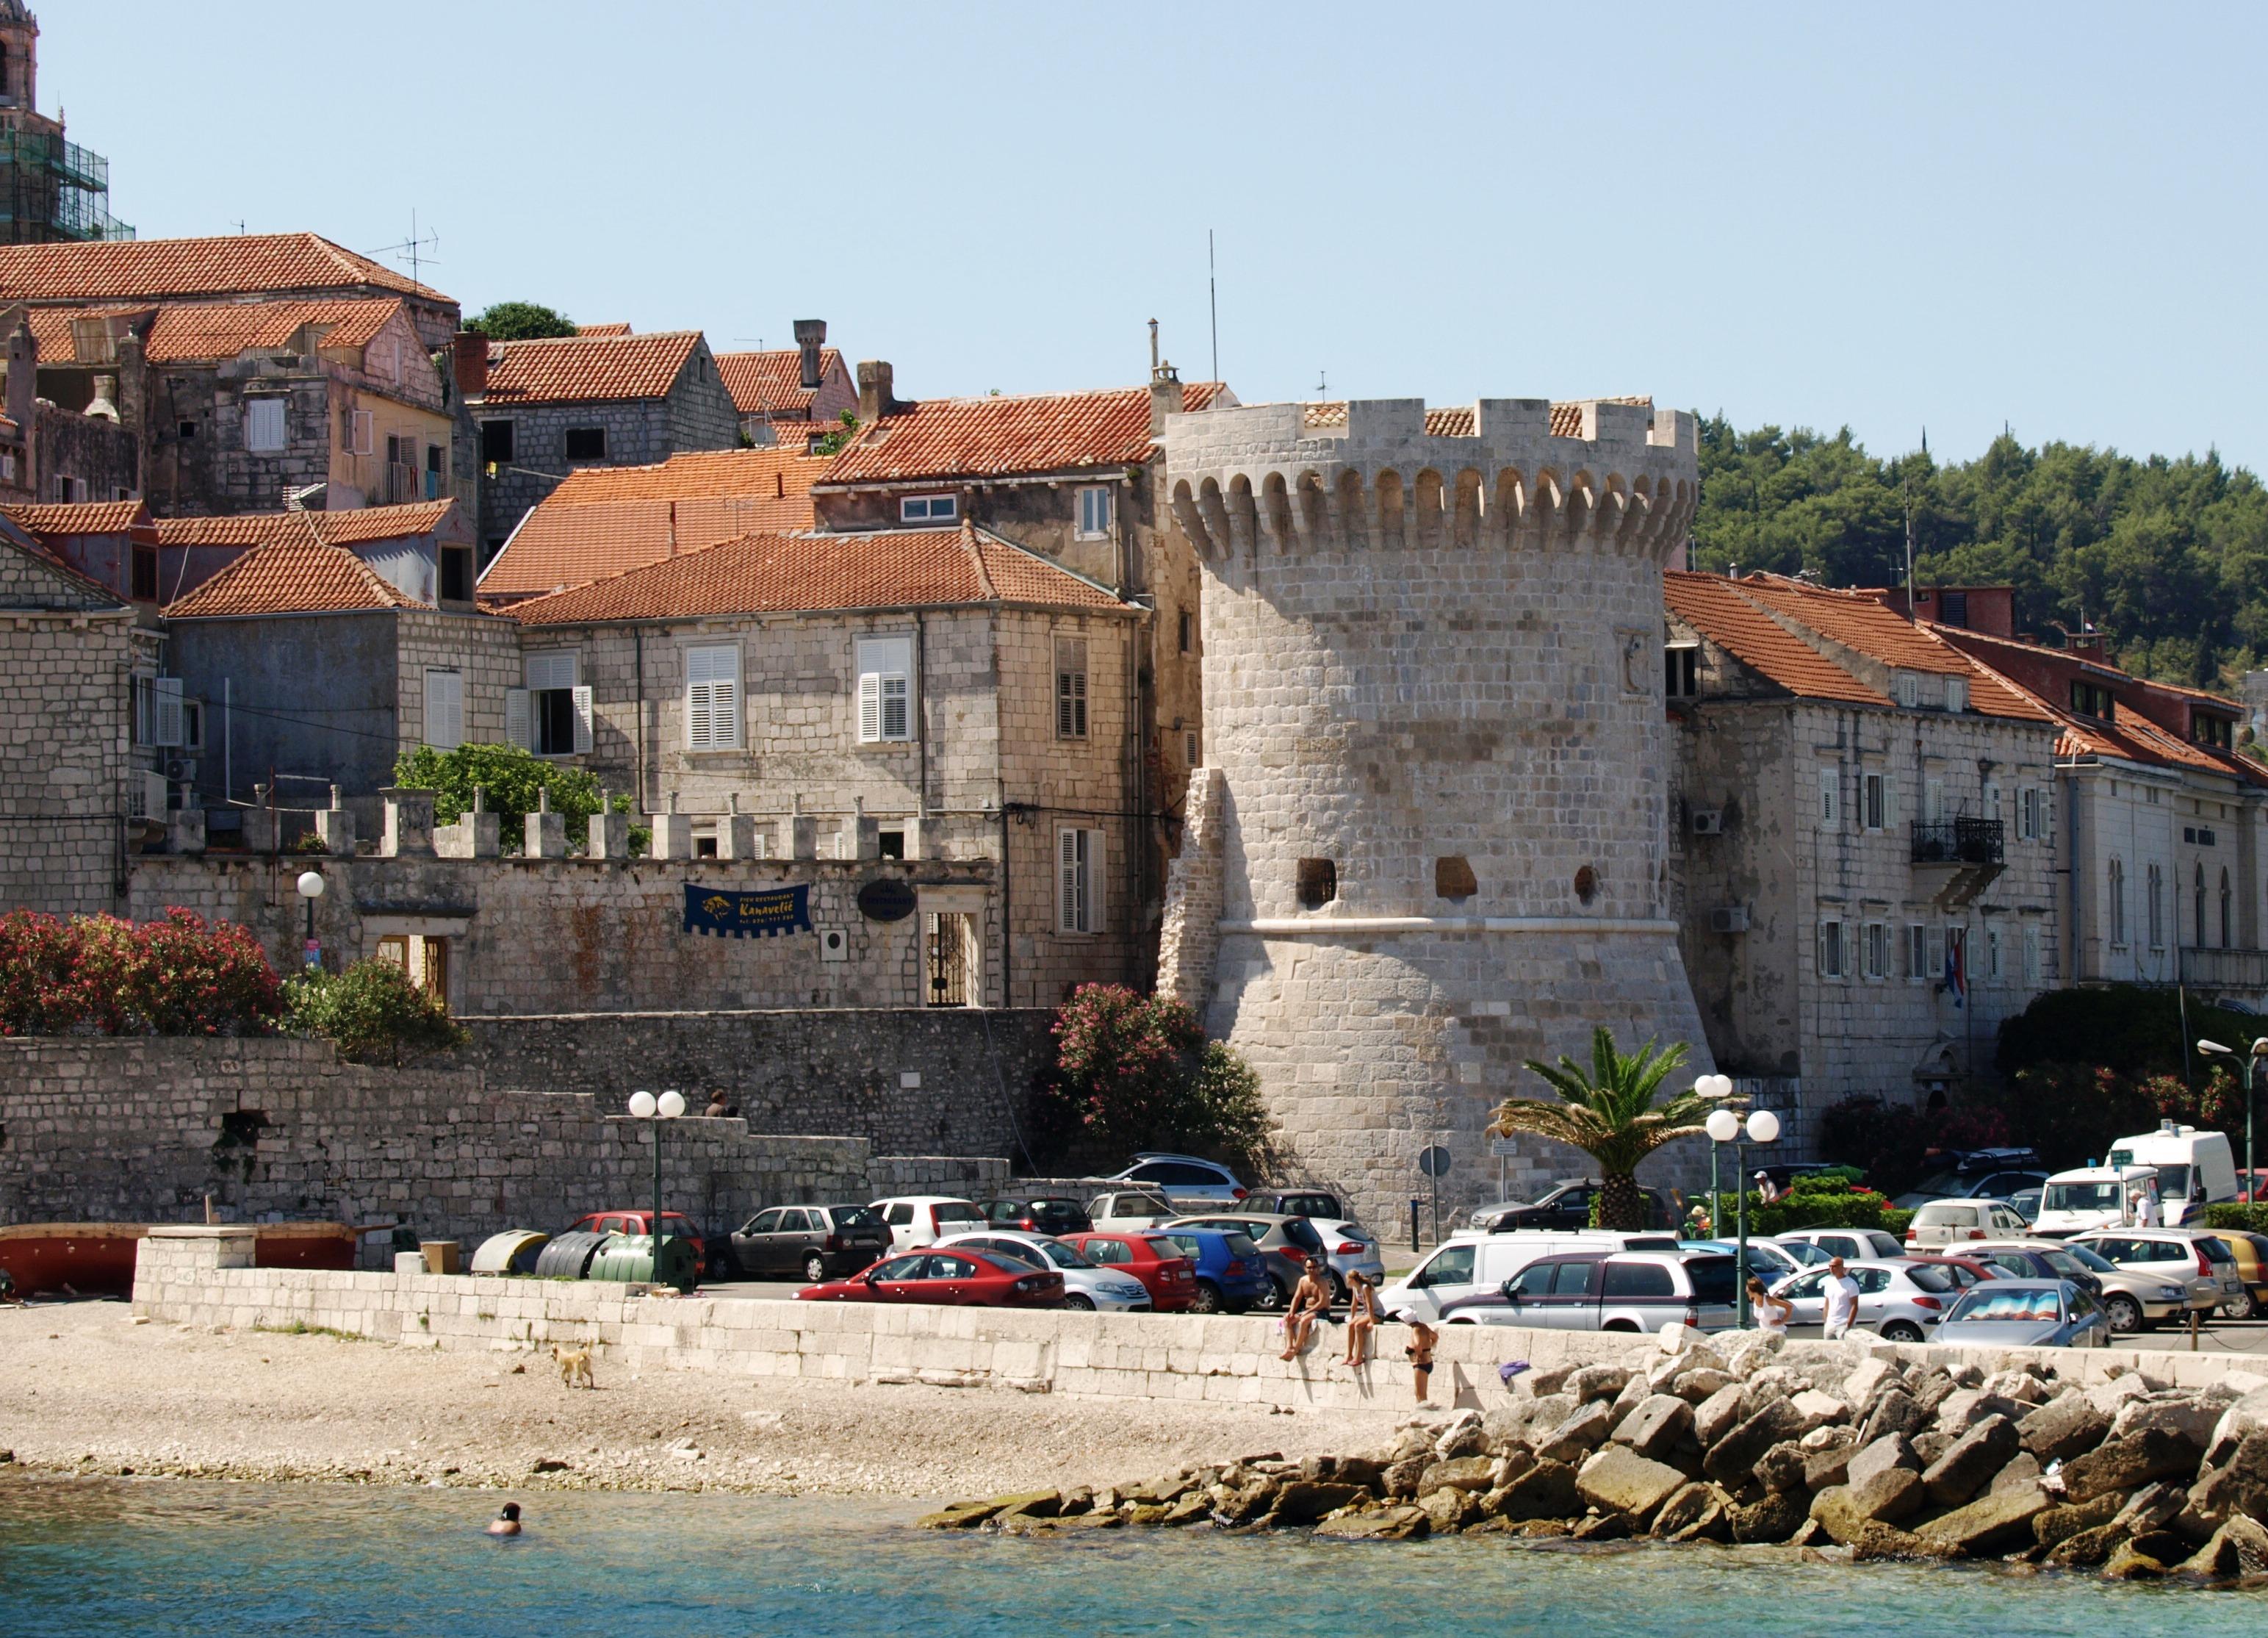 Korcula, Croacia. La cuna de Marco Polo. | Mundo Exótico